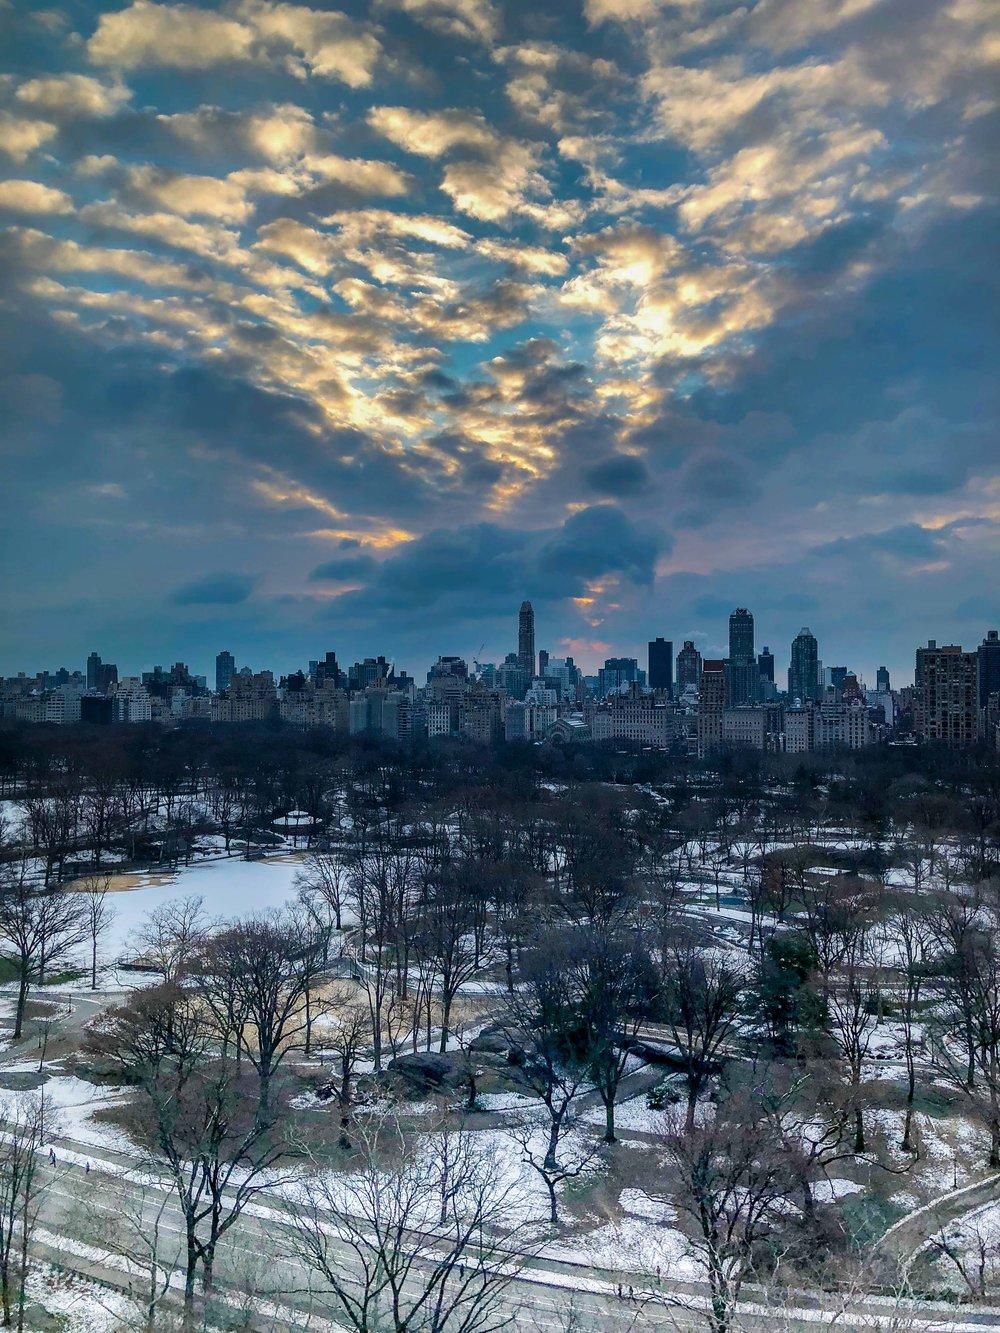 Winter Sunrise. Central Park, NY 2018